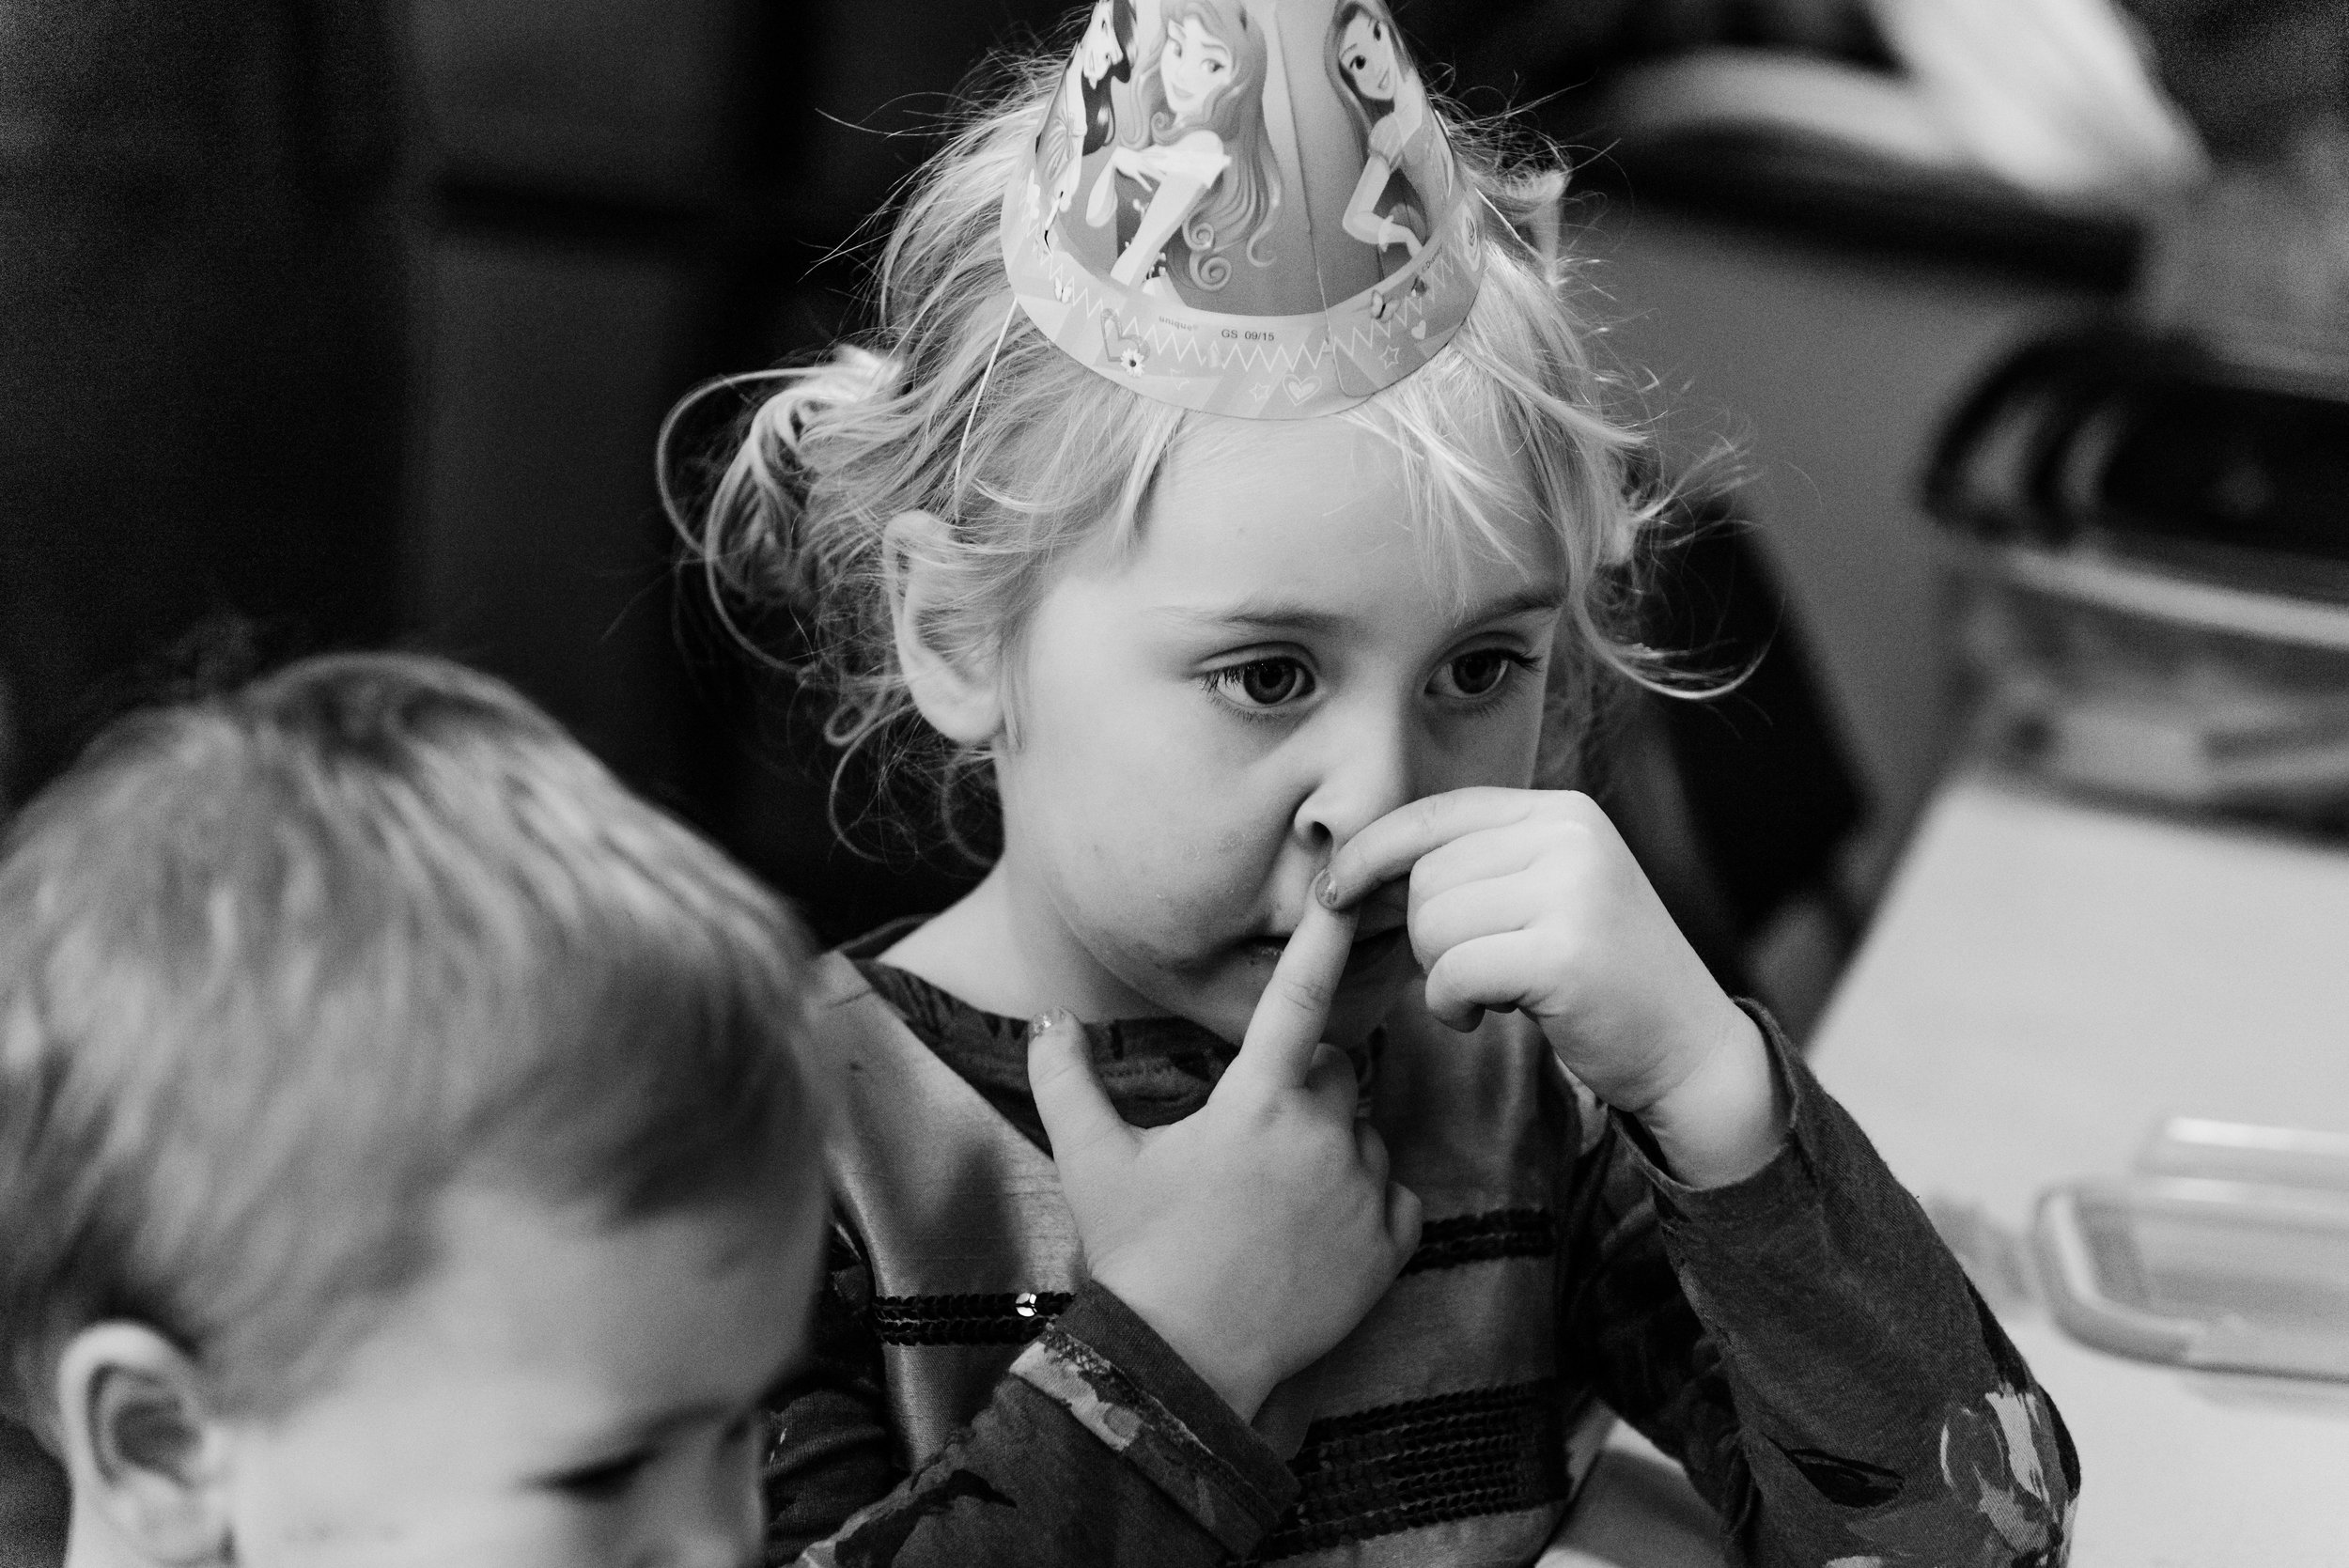 Nicola_Reiersen_Photography_Kids_Birthday_Pool_Party (50).jpg